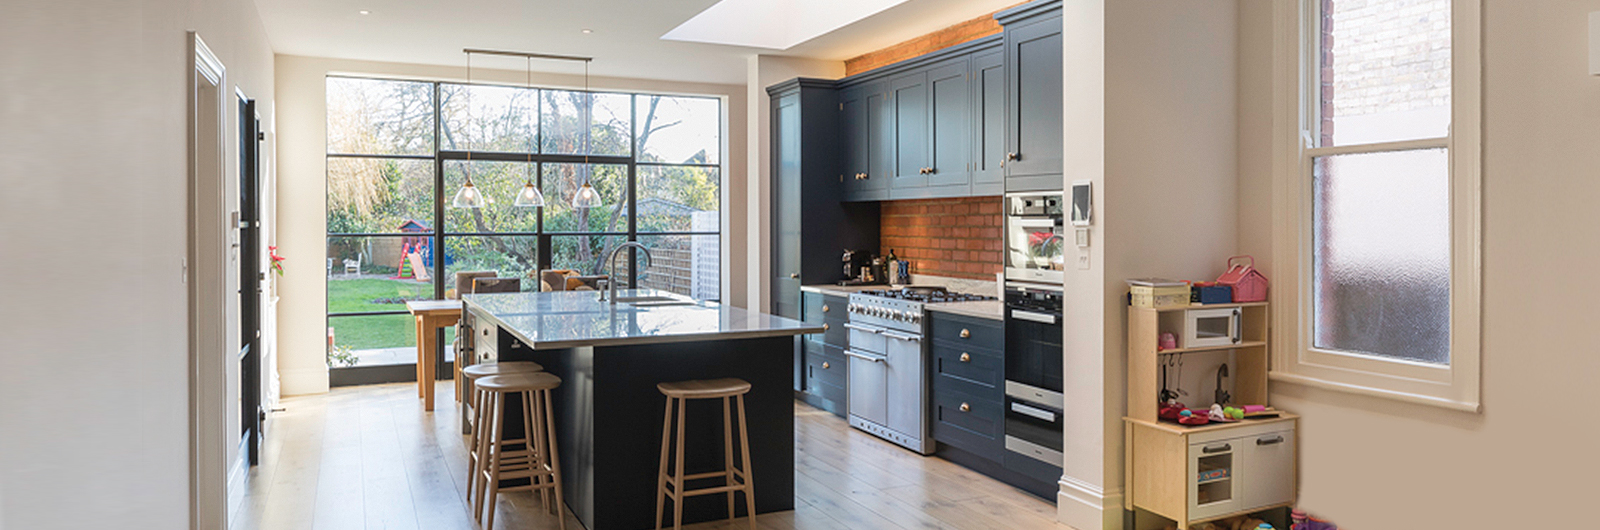 Monkhams Drive - Interior Design - Cullen Construction